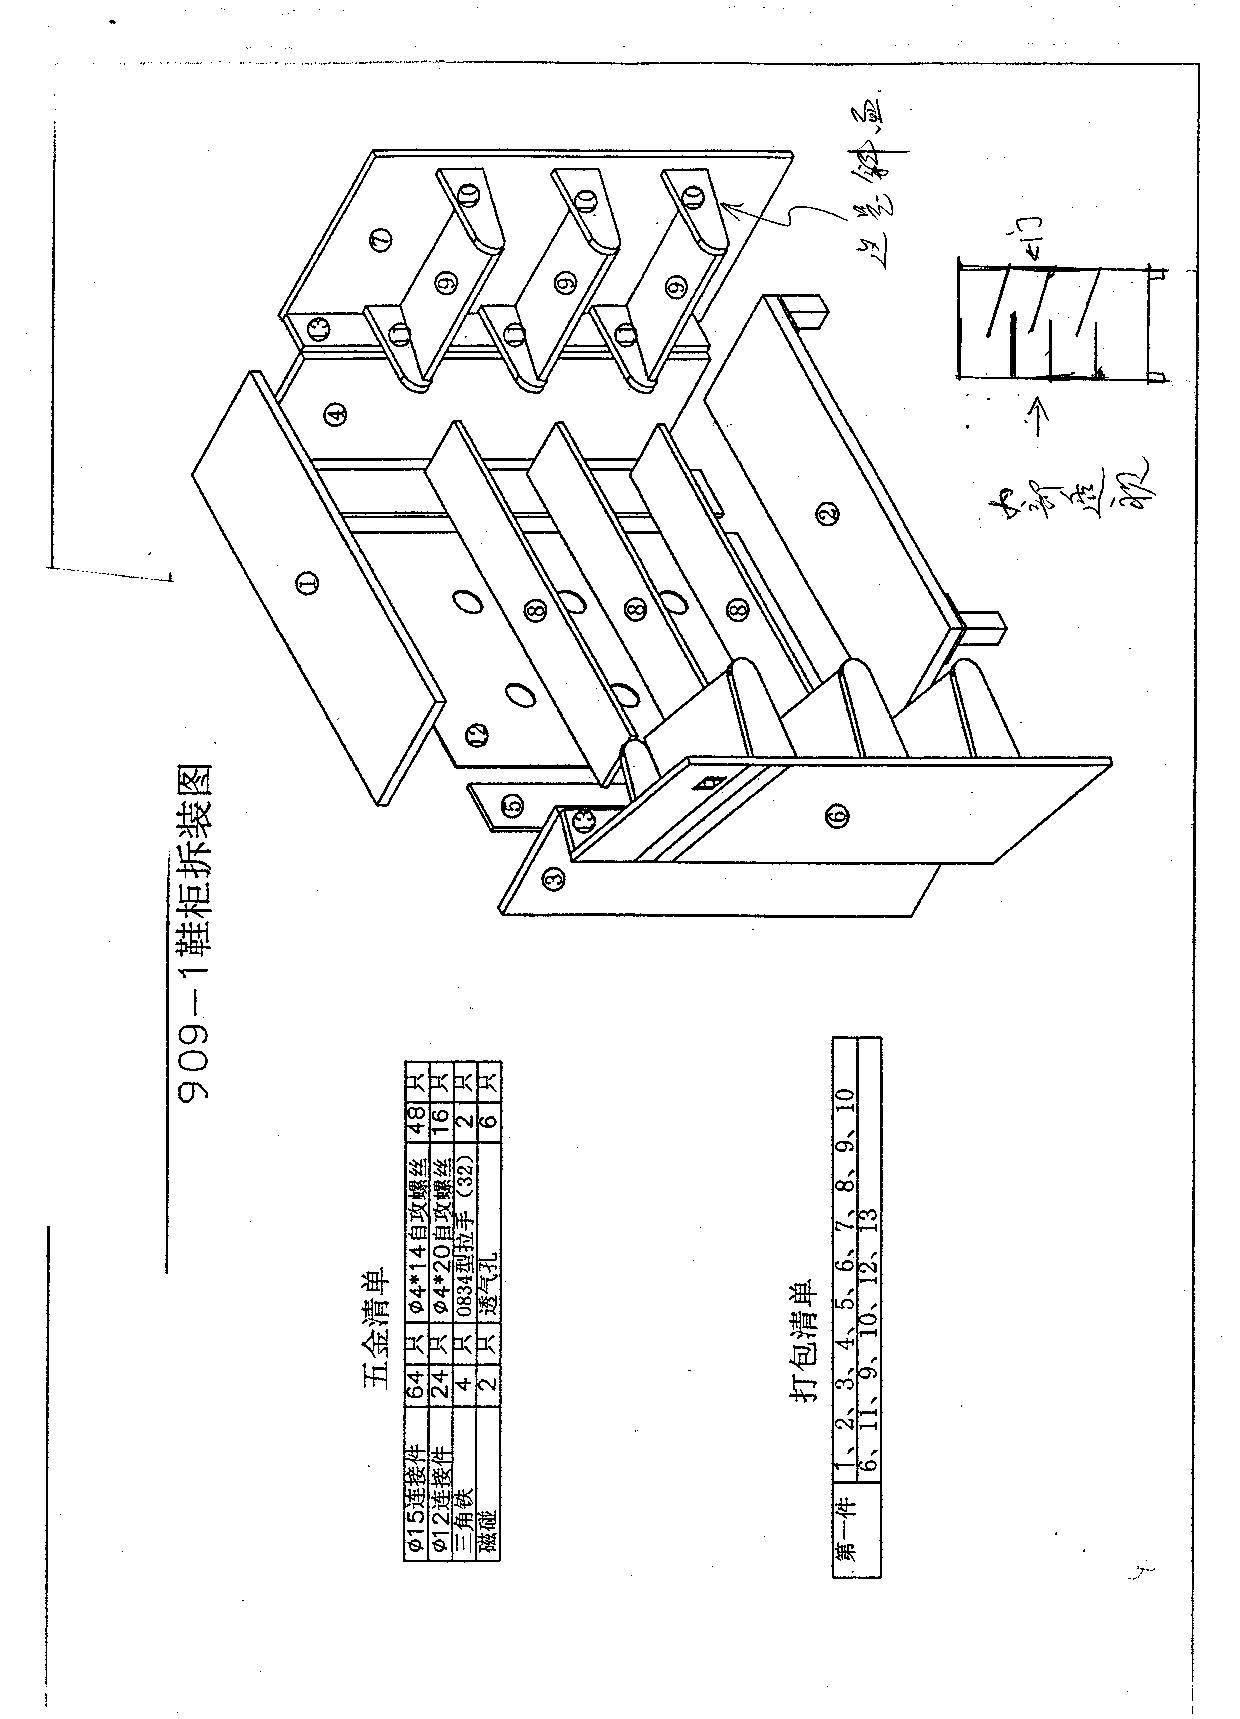 installation diagram: office furniture melbourne